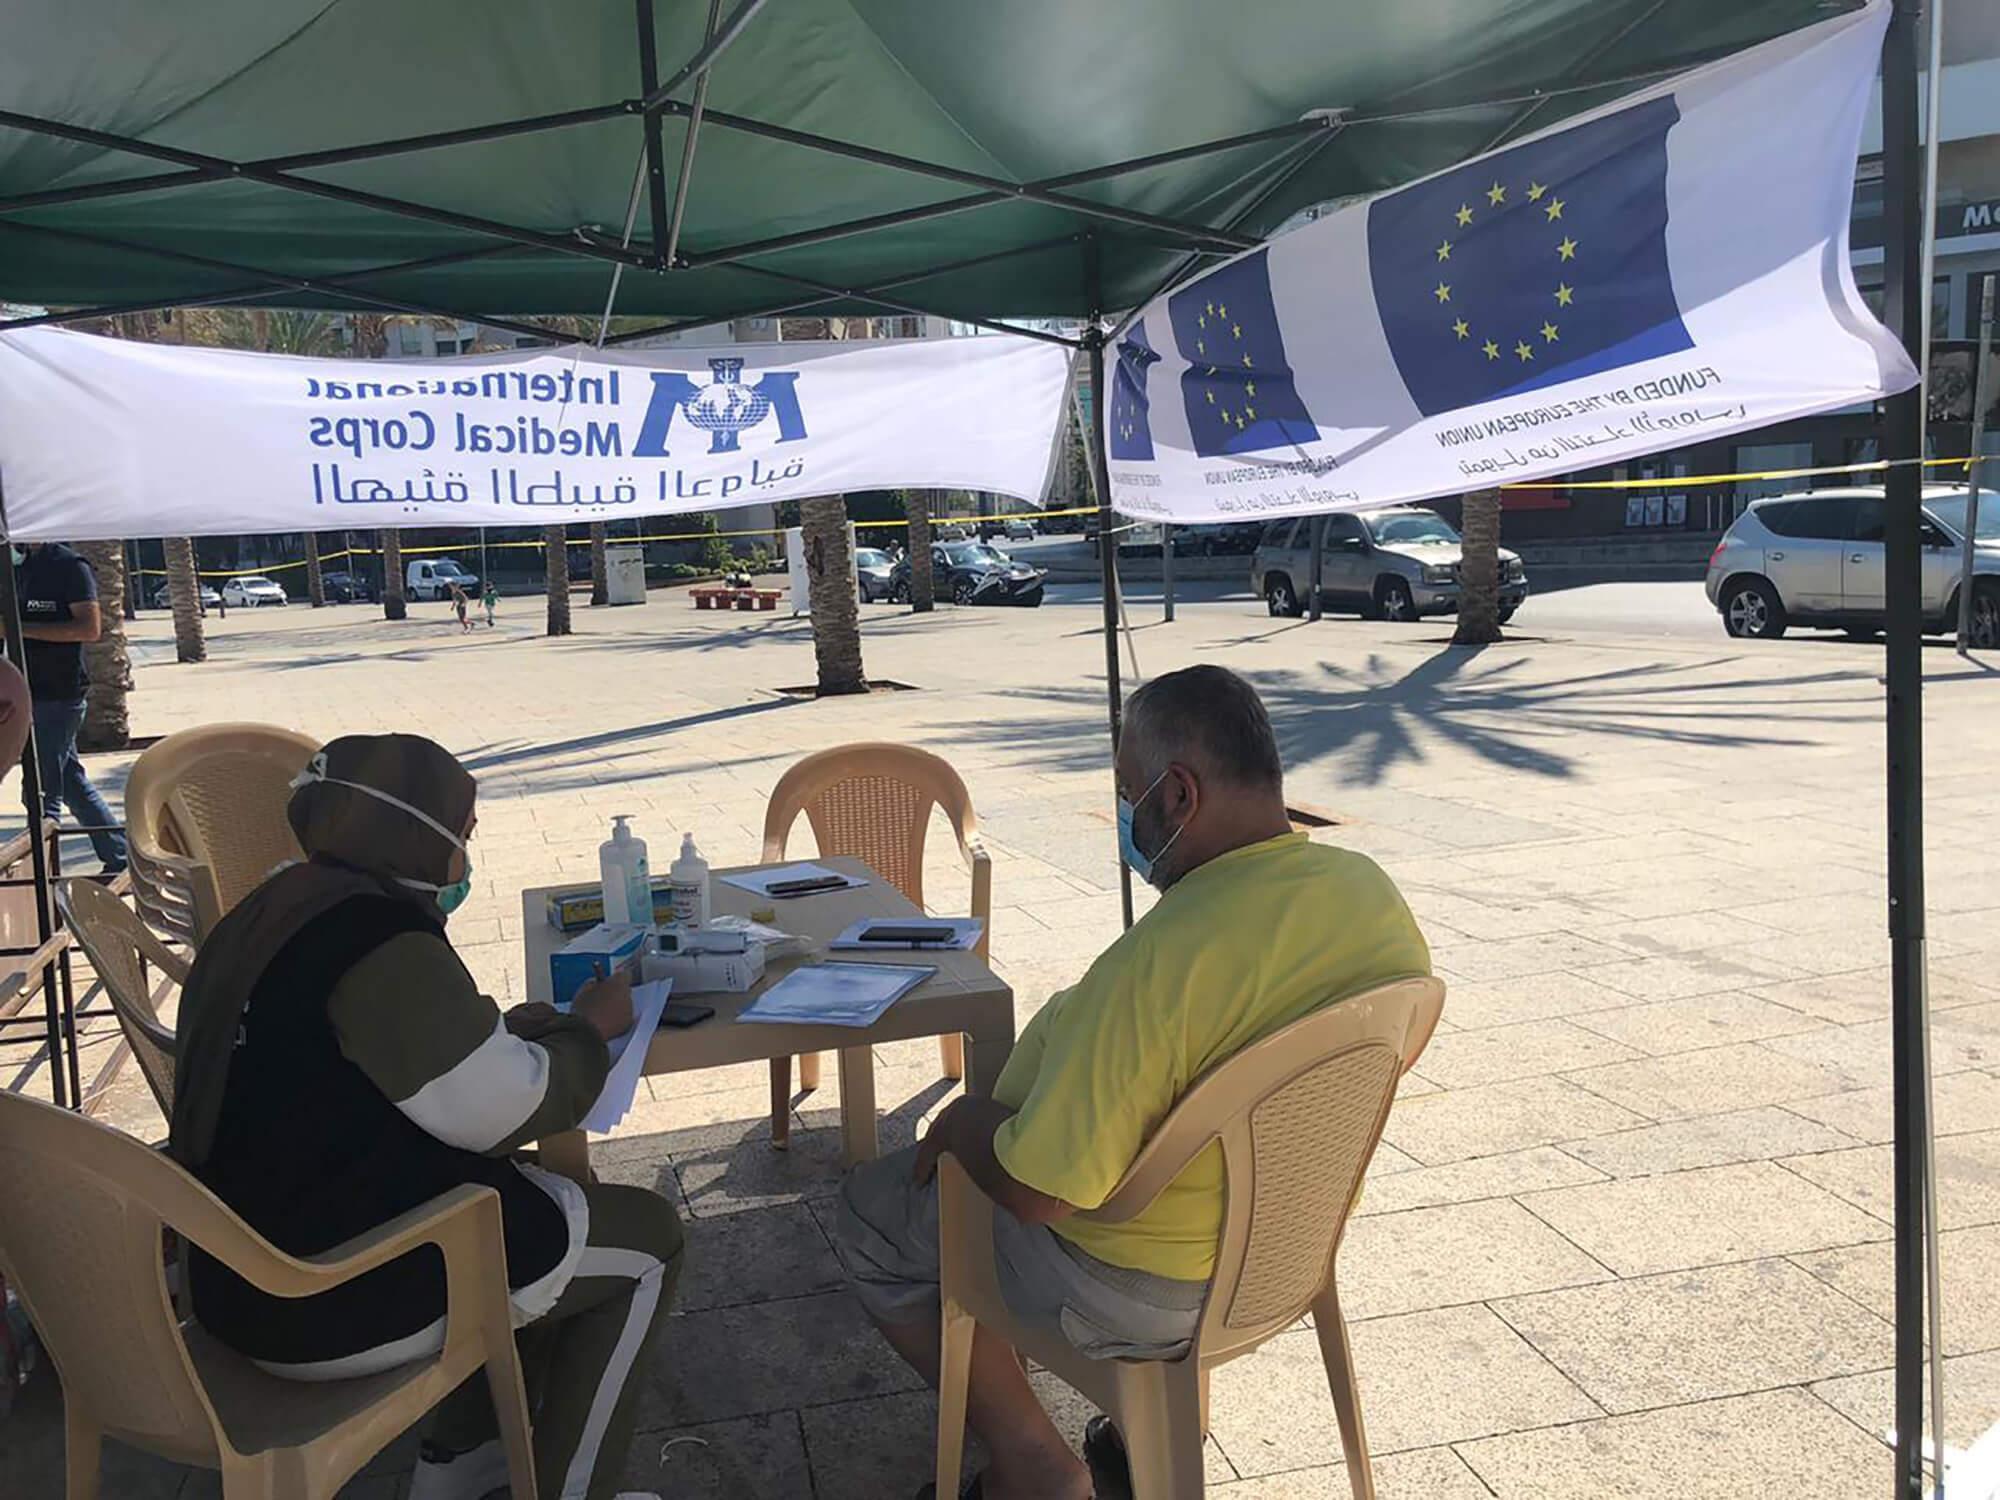 A mobile mental health unit in Ein El Mreisseh.